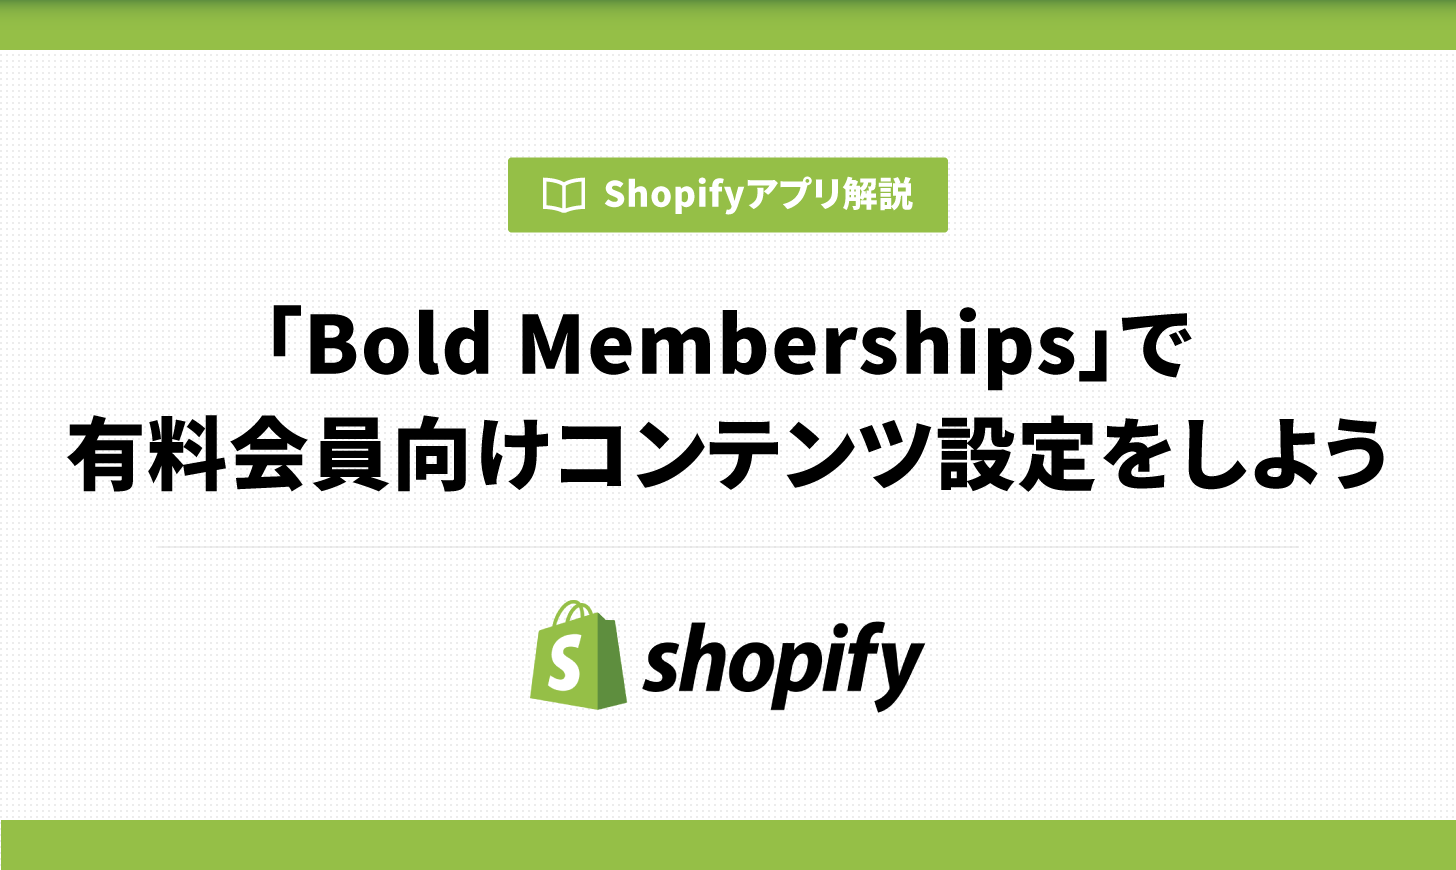 Bold Membershipsで有料会員向けコンテンツ設定をしよう